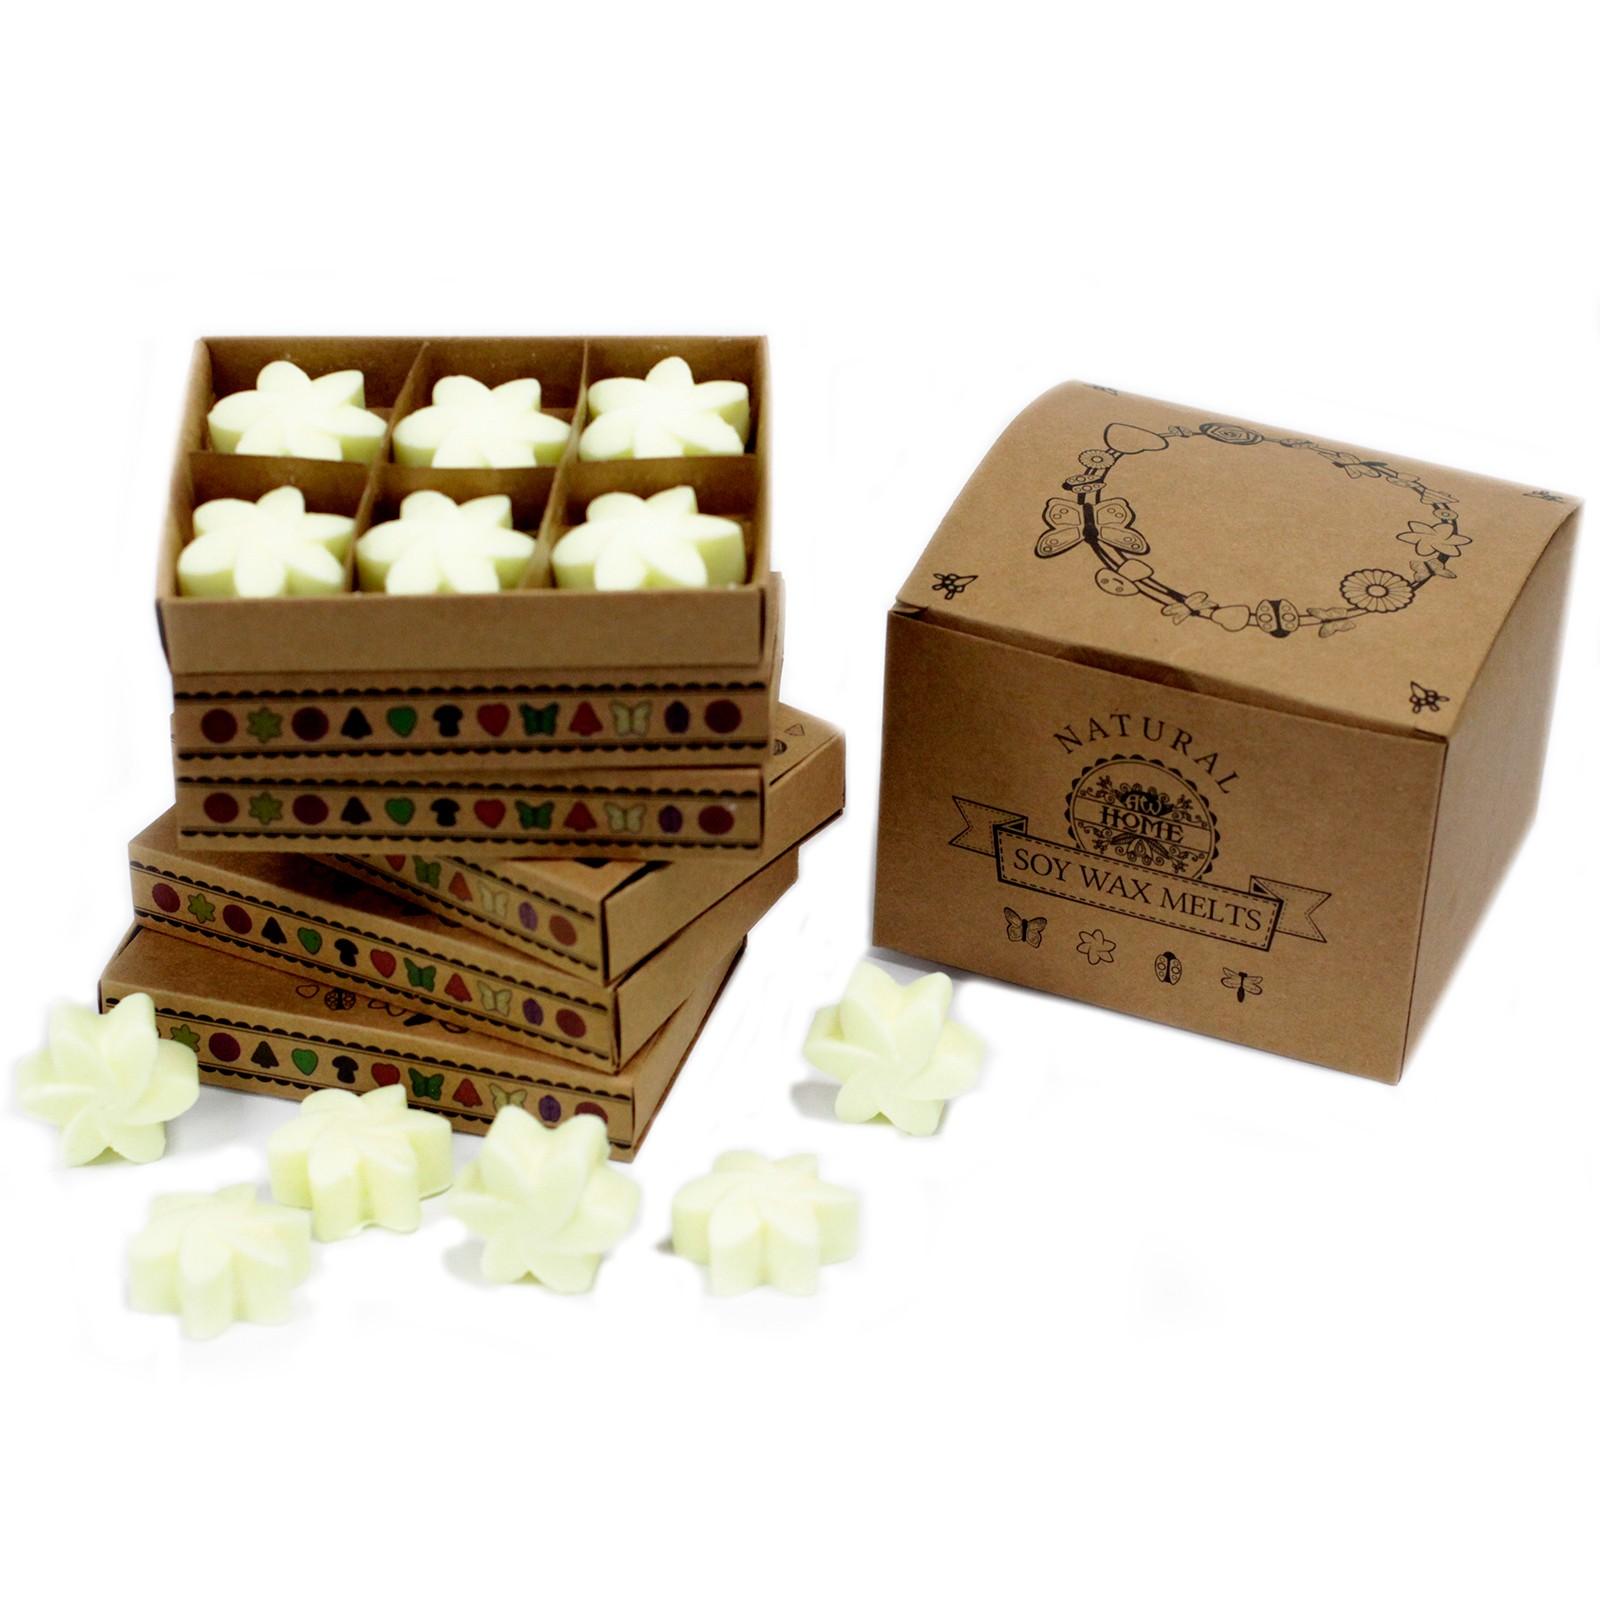 Box of 6 Wax Melts Lemon Harvest